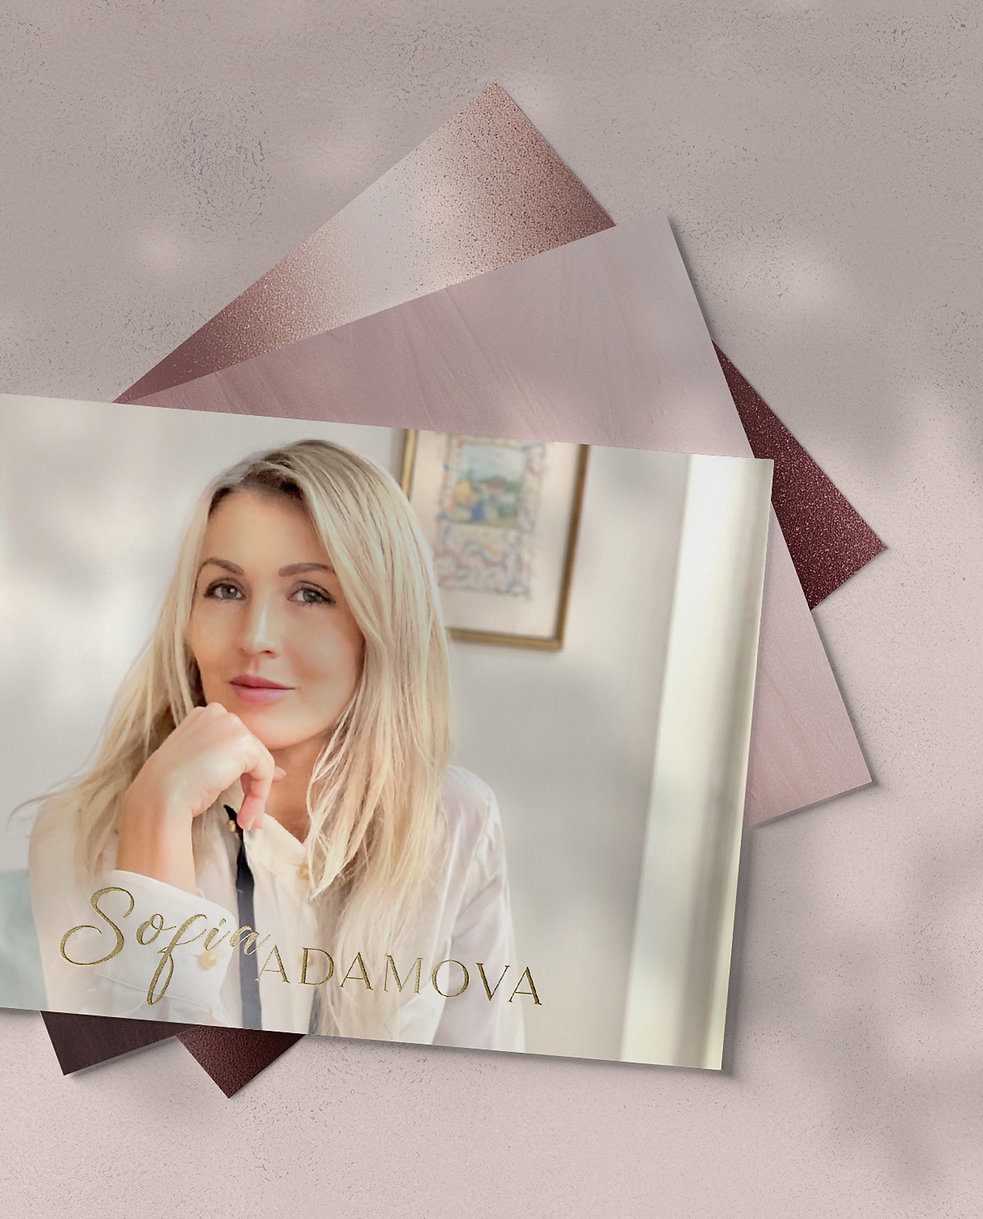 Sofia Adamova logo energy m cards.jpg